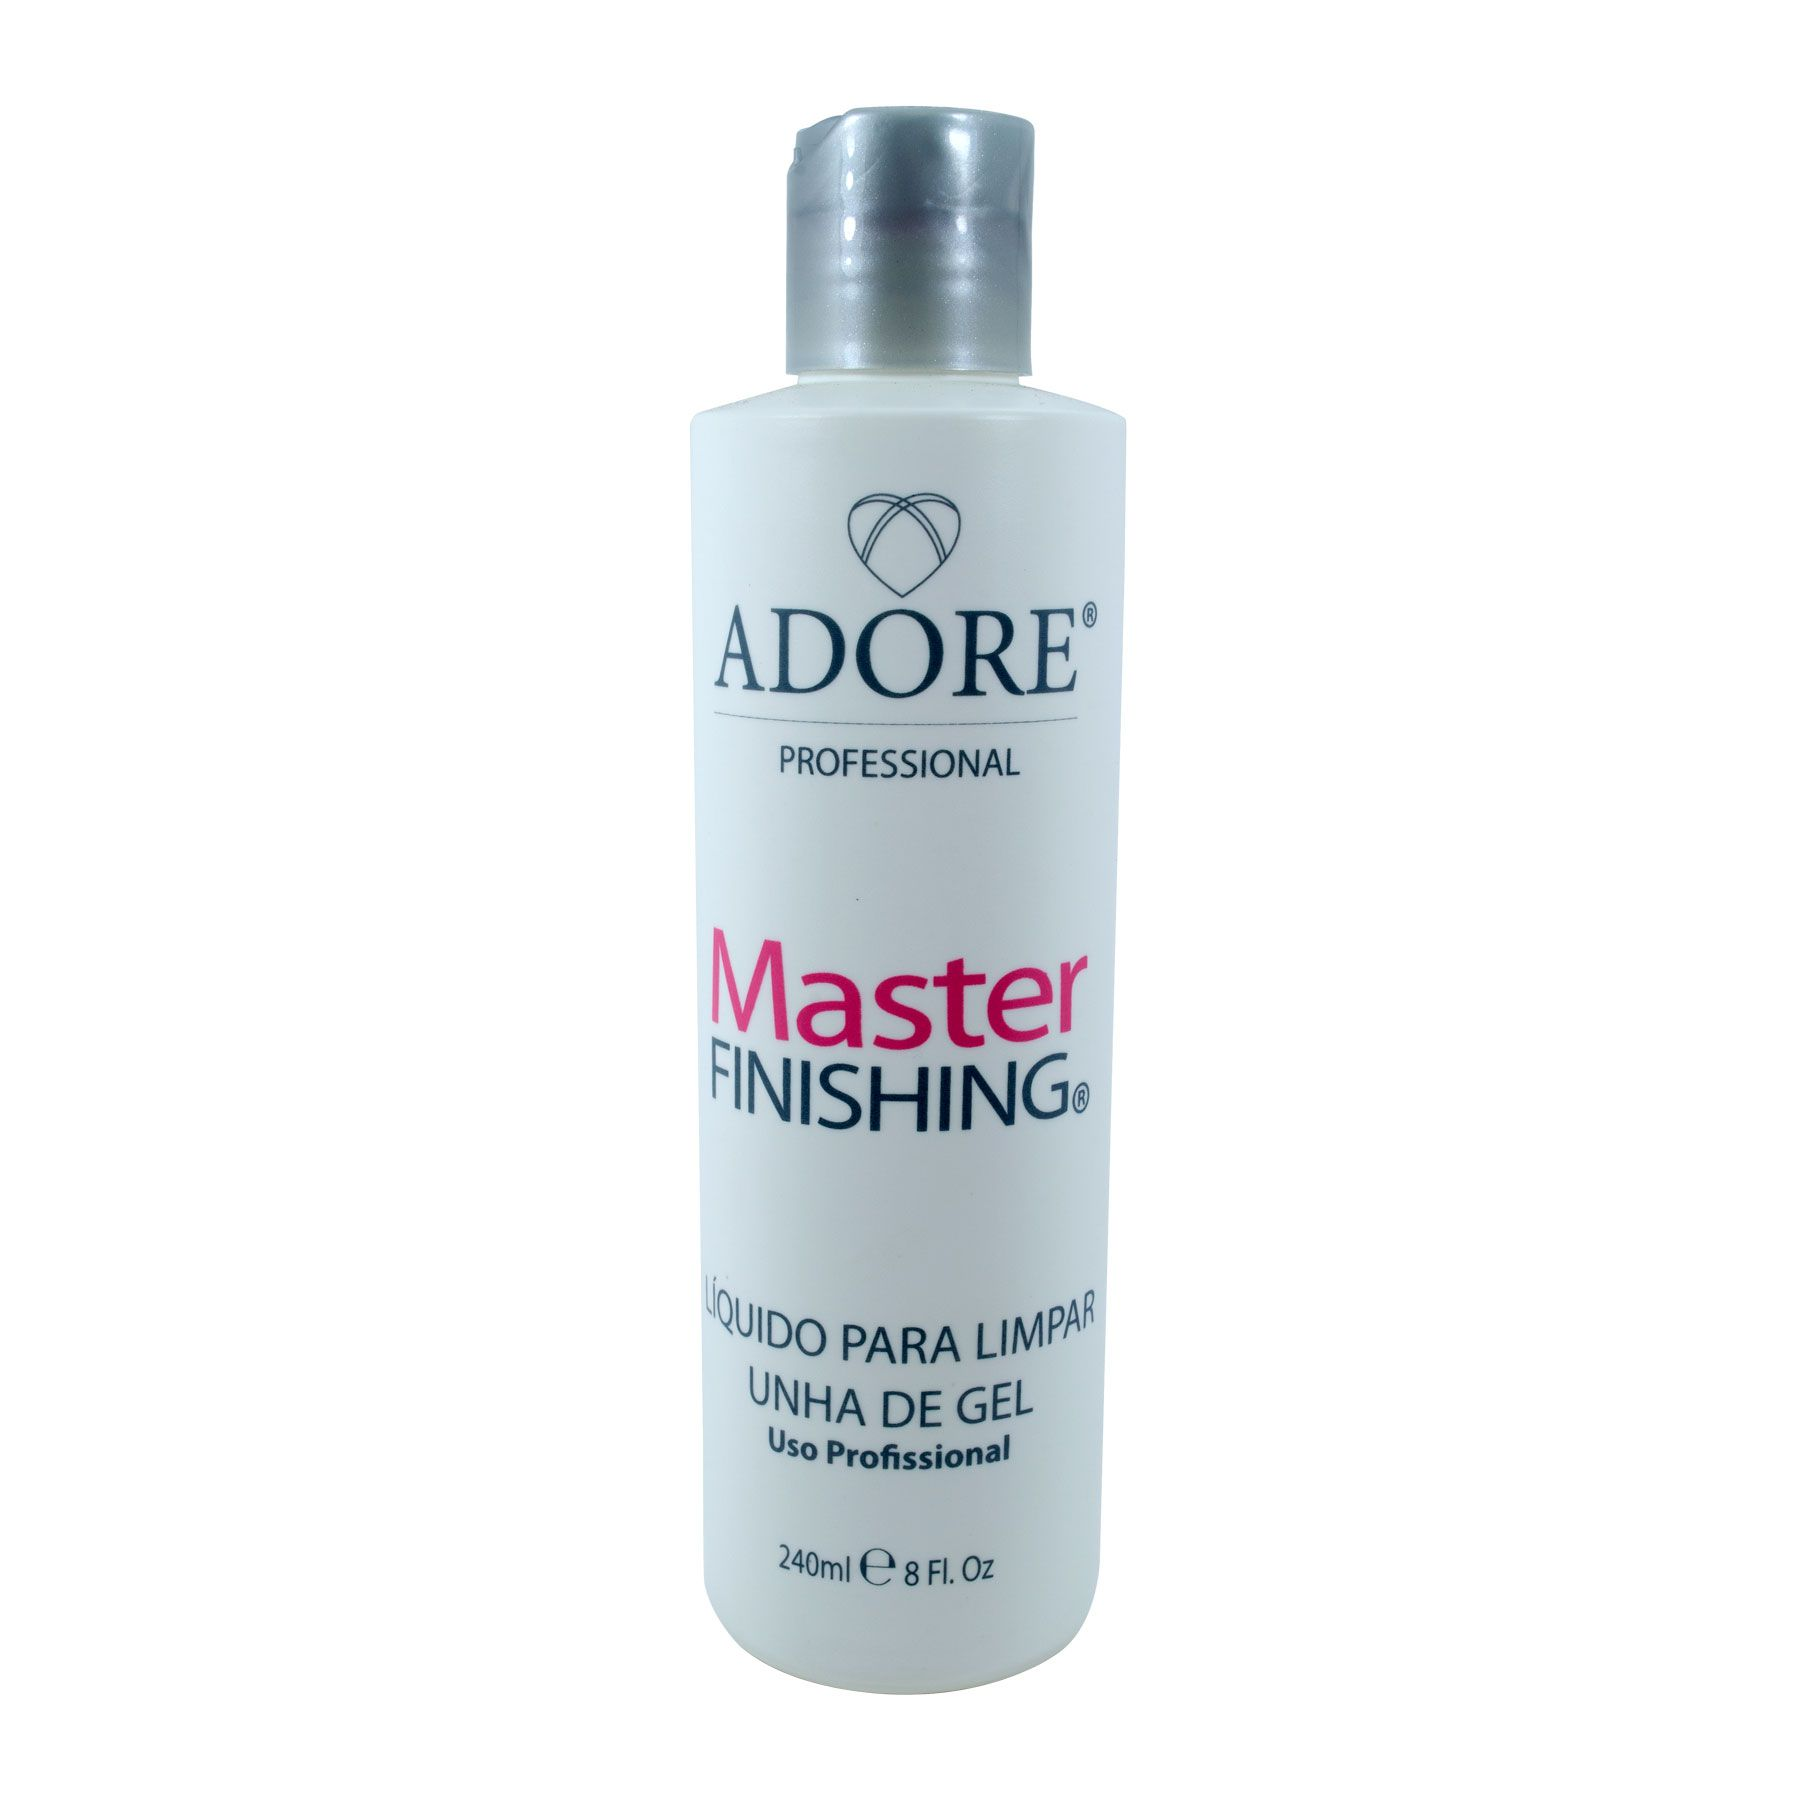 MASTER FINISHING ADORE - 240ML  - Sílvia Pedrarias & Cia